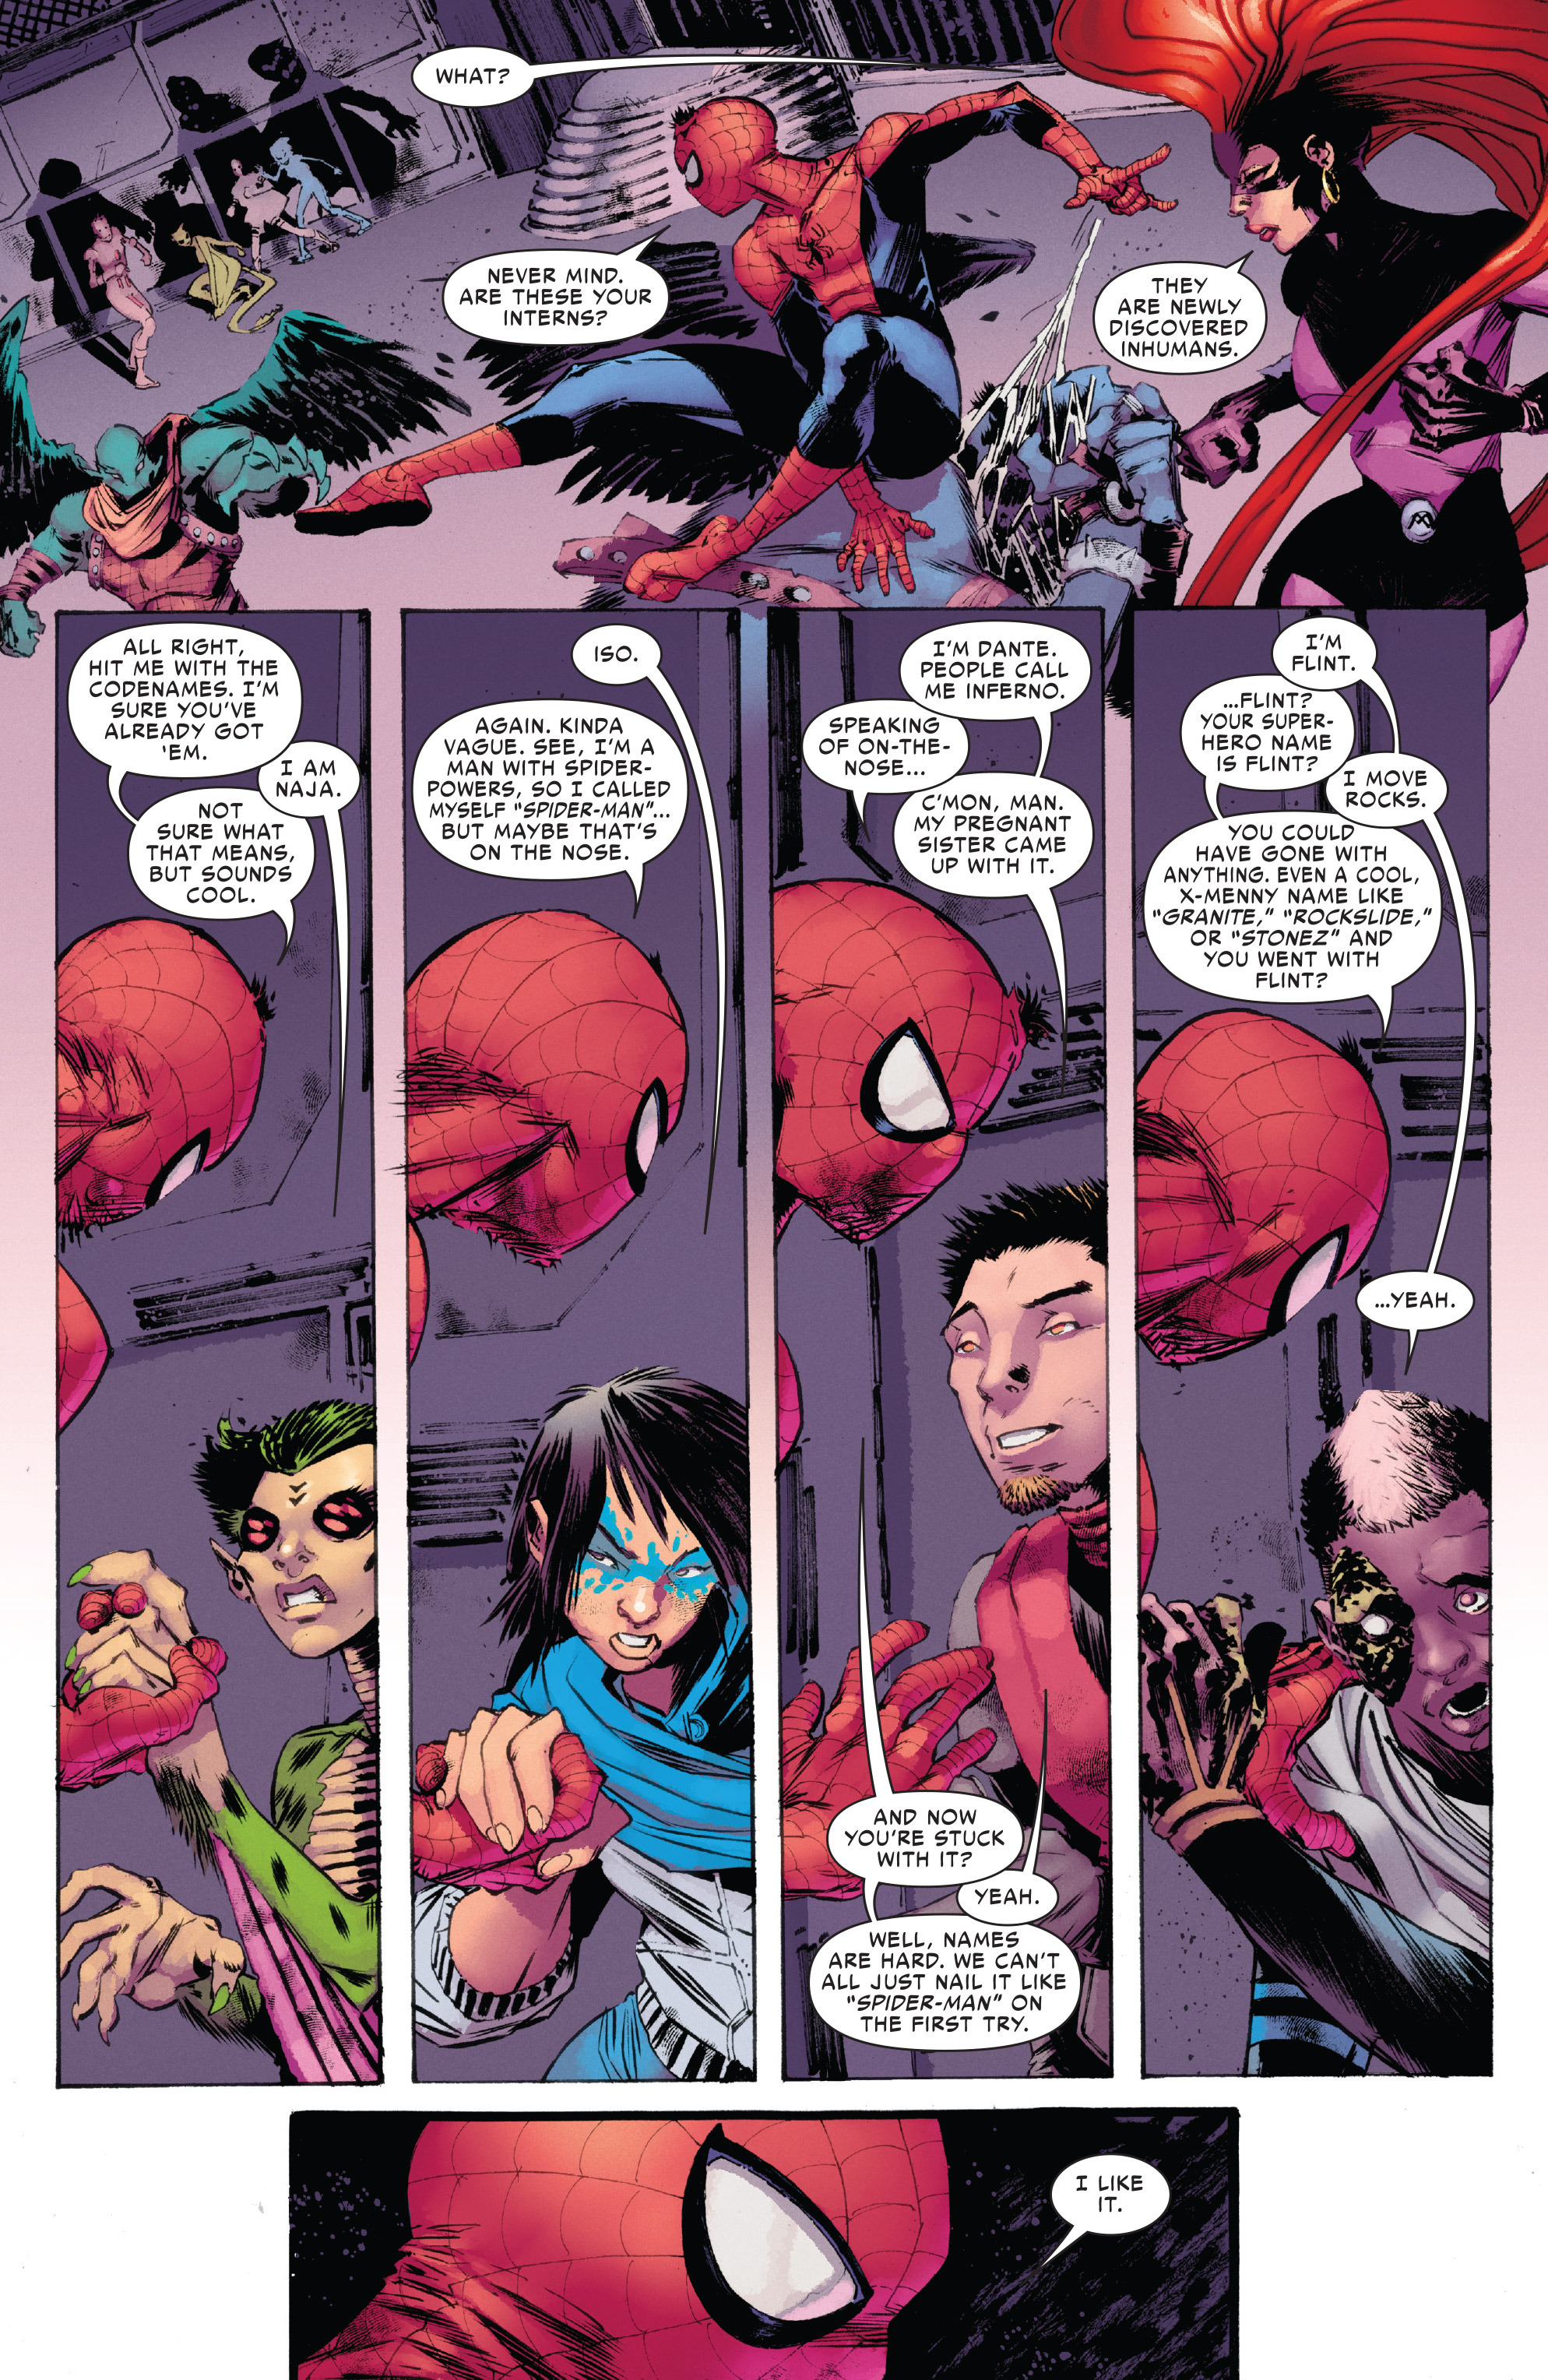 Amazing Spider-Man Special #1 Review: Stillanerd's Take ... Tobey Maguire 2015